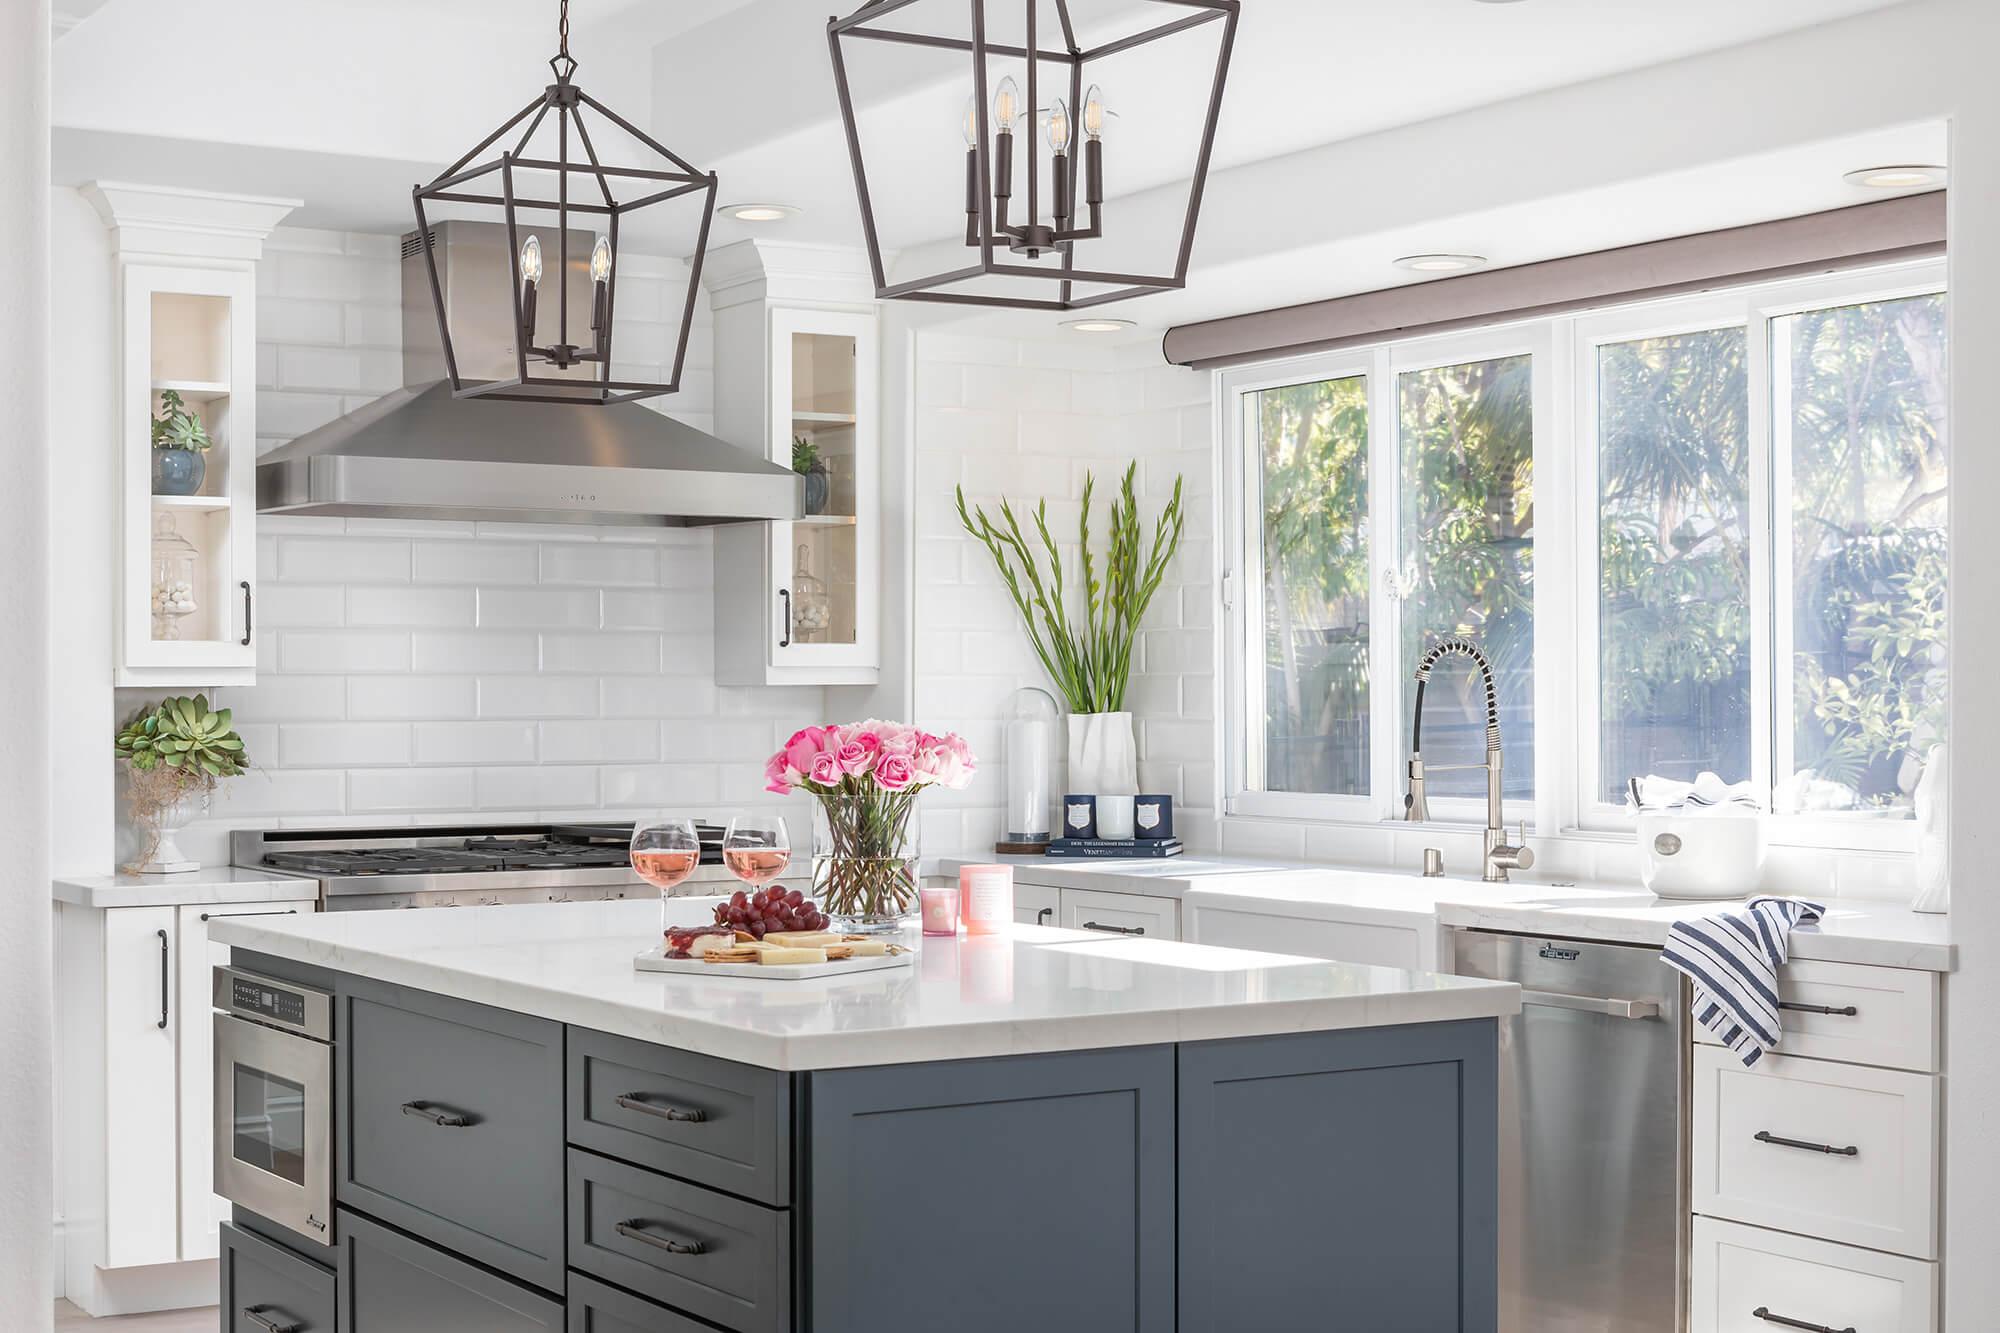 all-white-subway-tile-kitchen-design